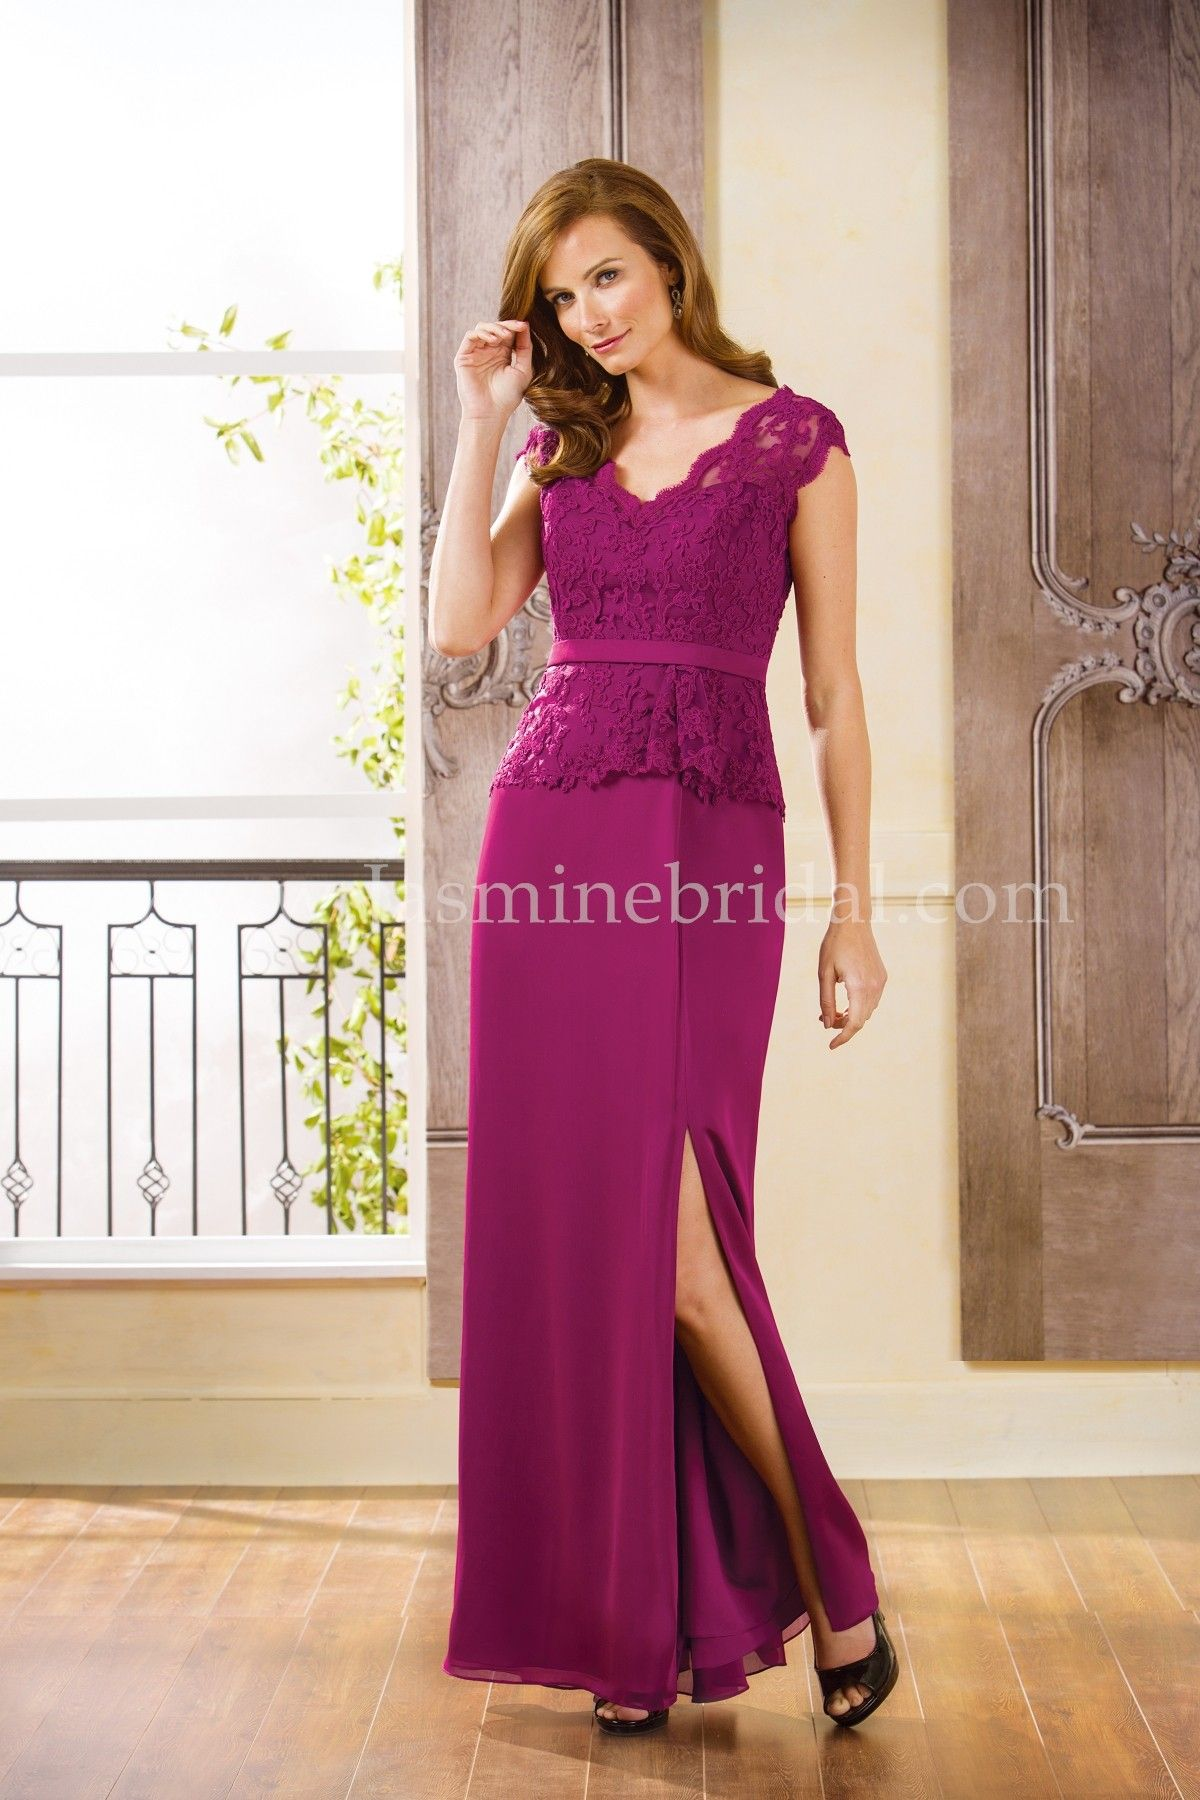 Moderno Vestidos De Dama De Baton Rouge Ornamento - Colección de ...